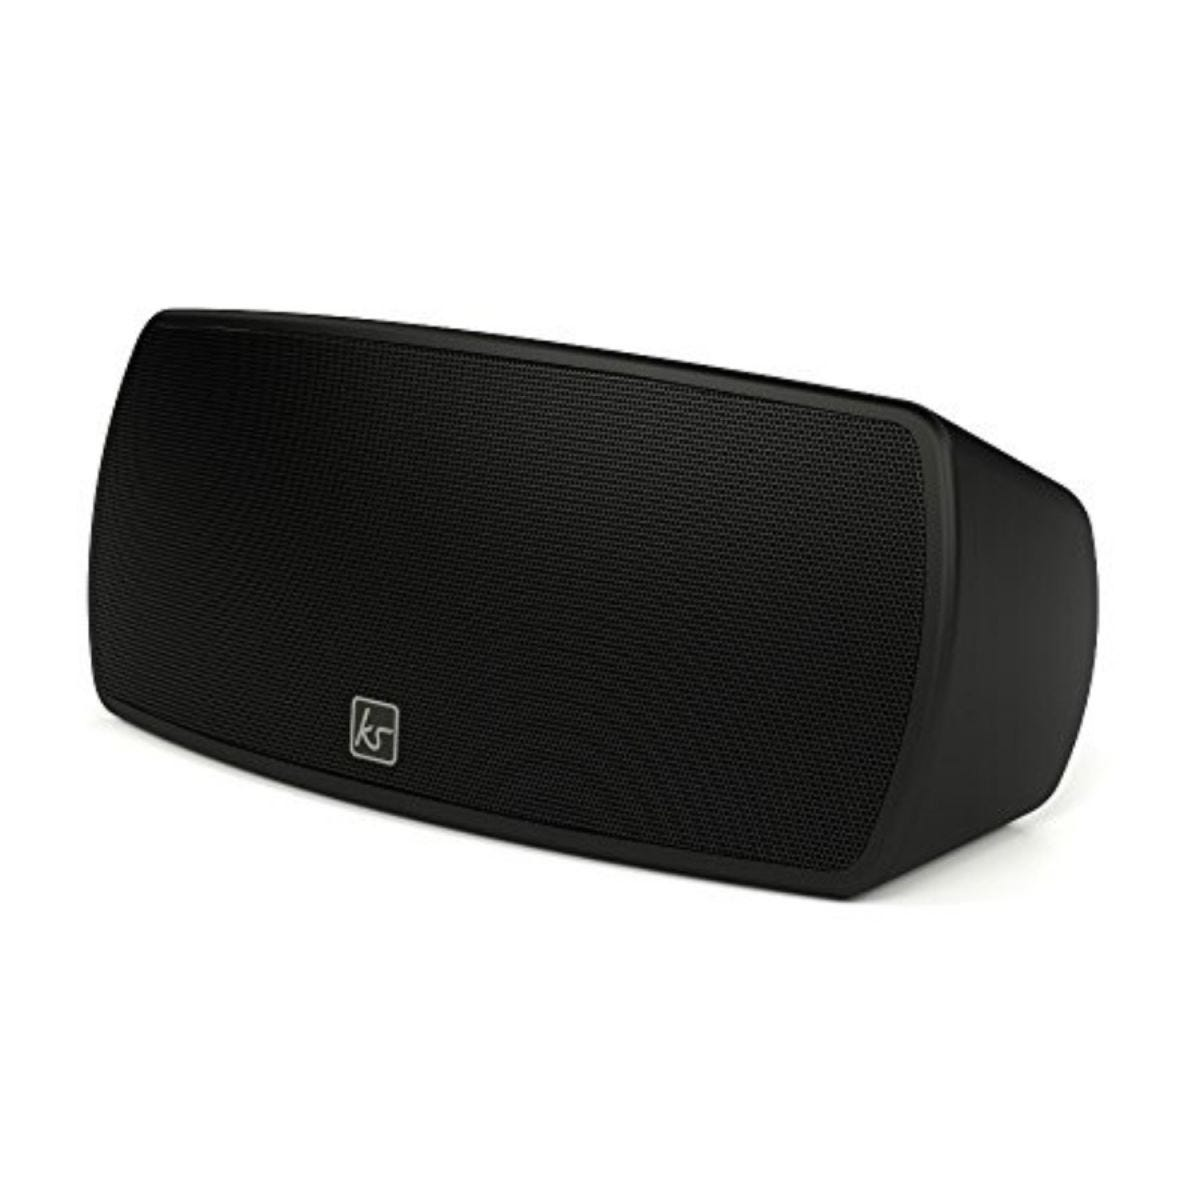 Kitsound Slam 2 Bluetooth Speaker